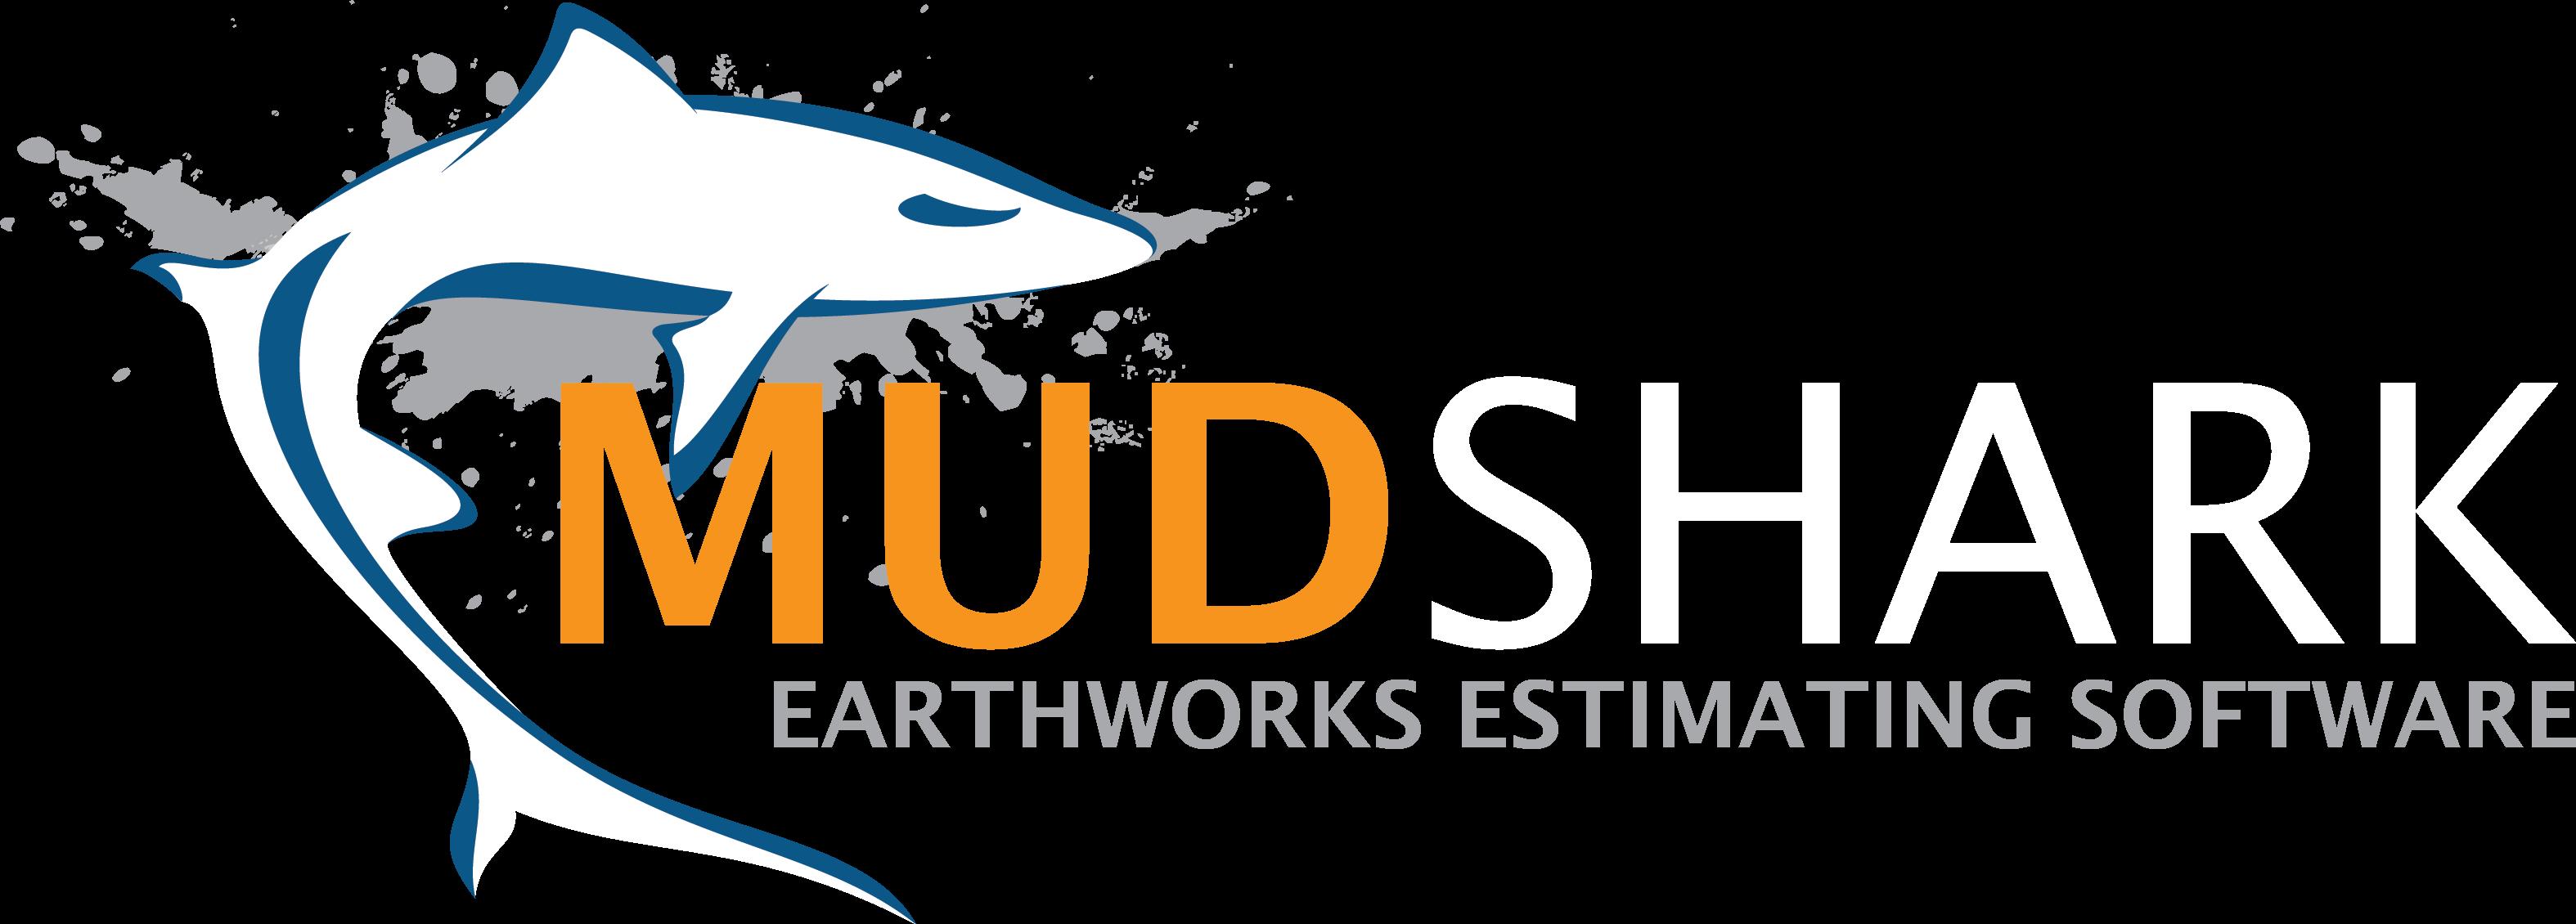 Mudshark Eartworks